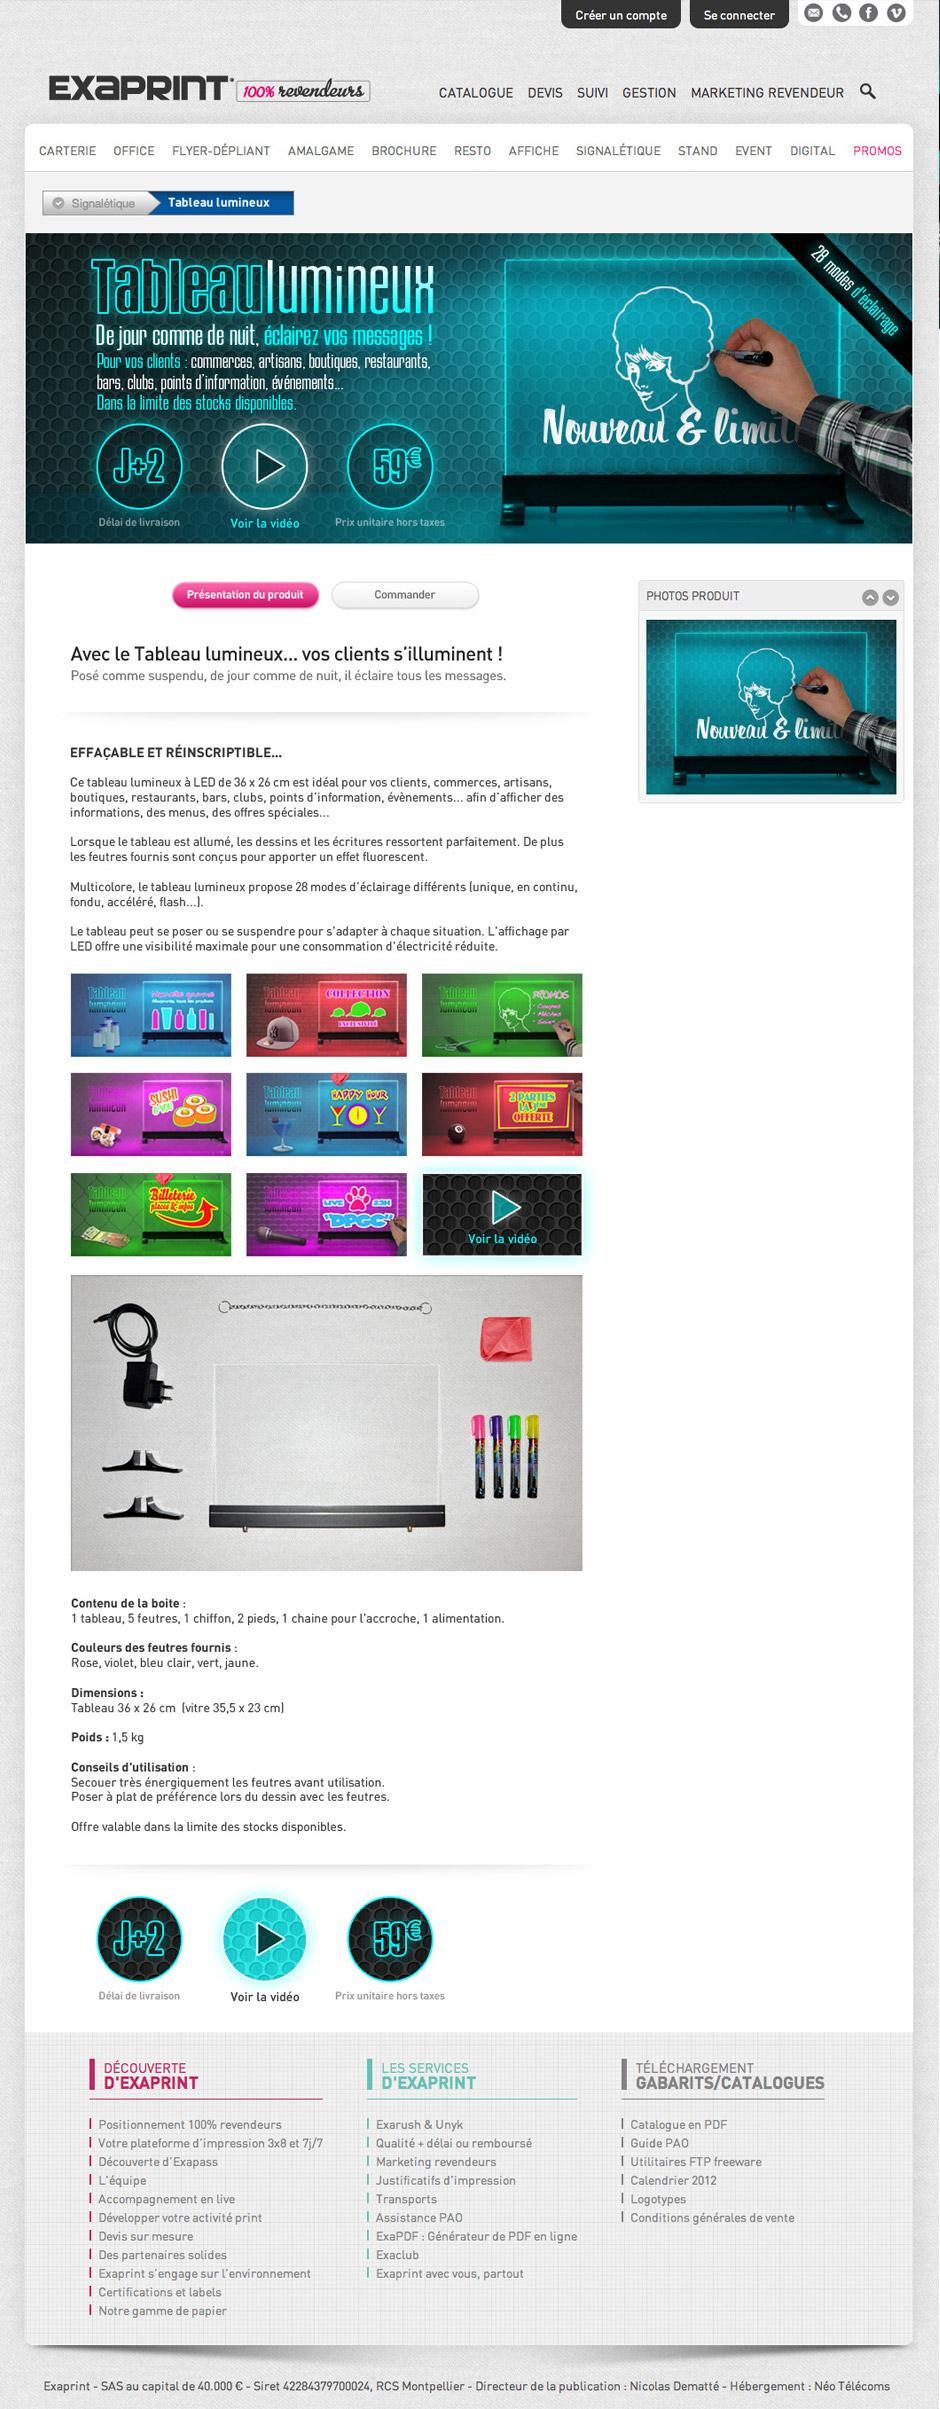 graphiste-montpellier-creation-exaprint-tableau-lumineux-agence-communication-montpellier-caconcept-alexis-cretin-3